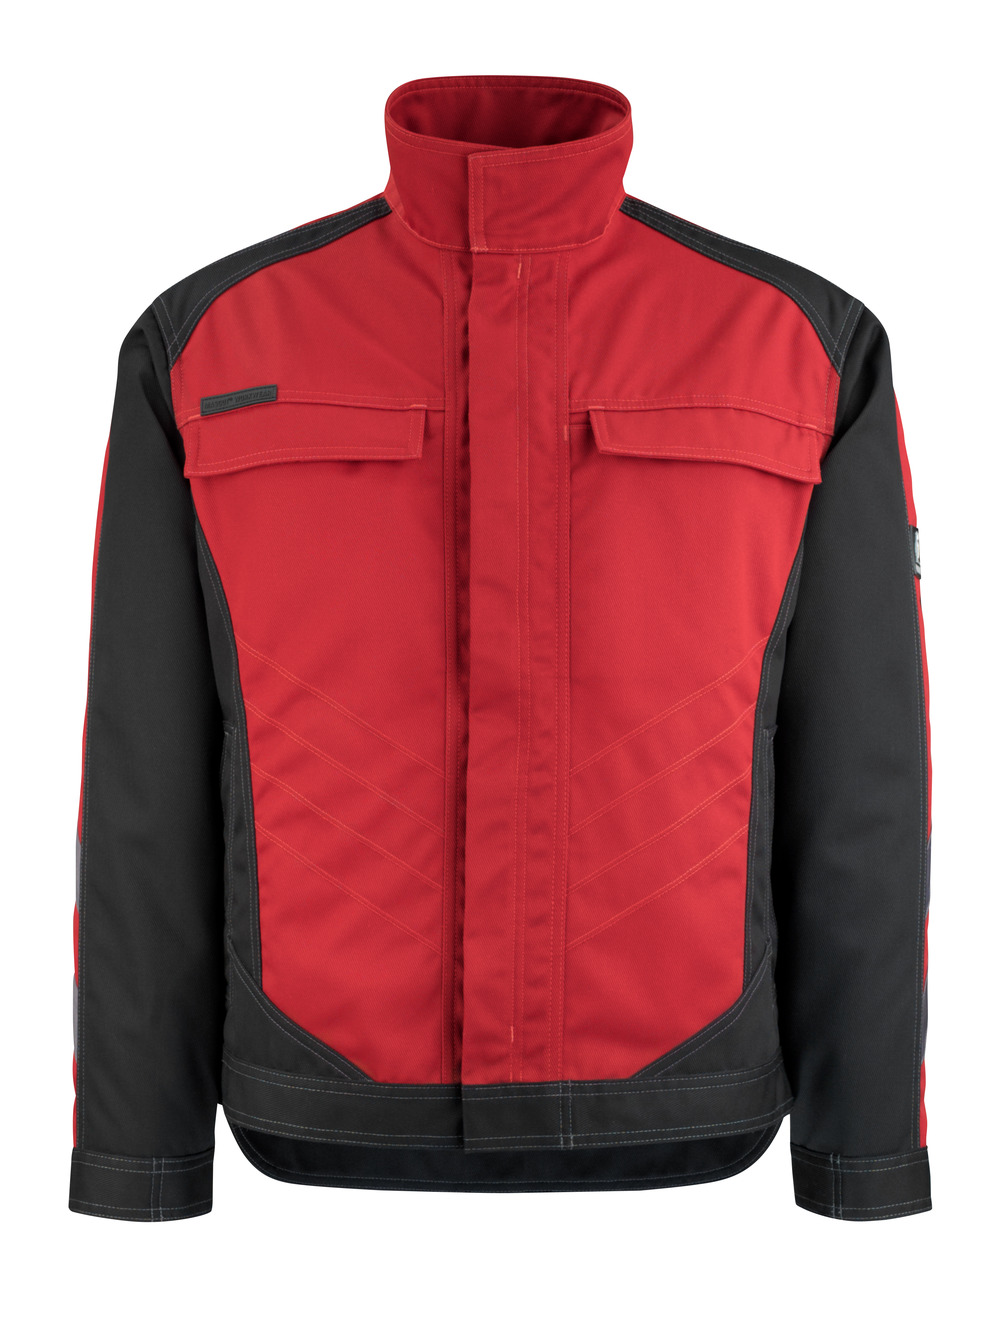 12009-203-0209 Jacket - red/black